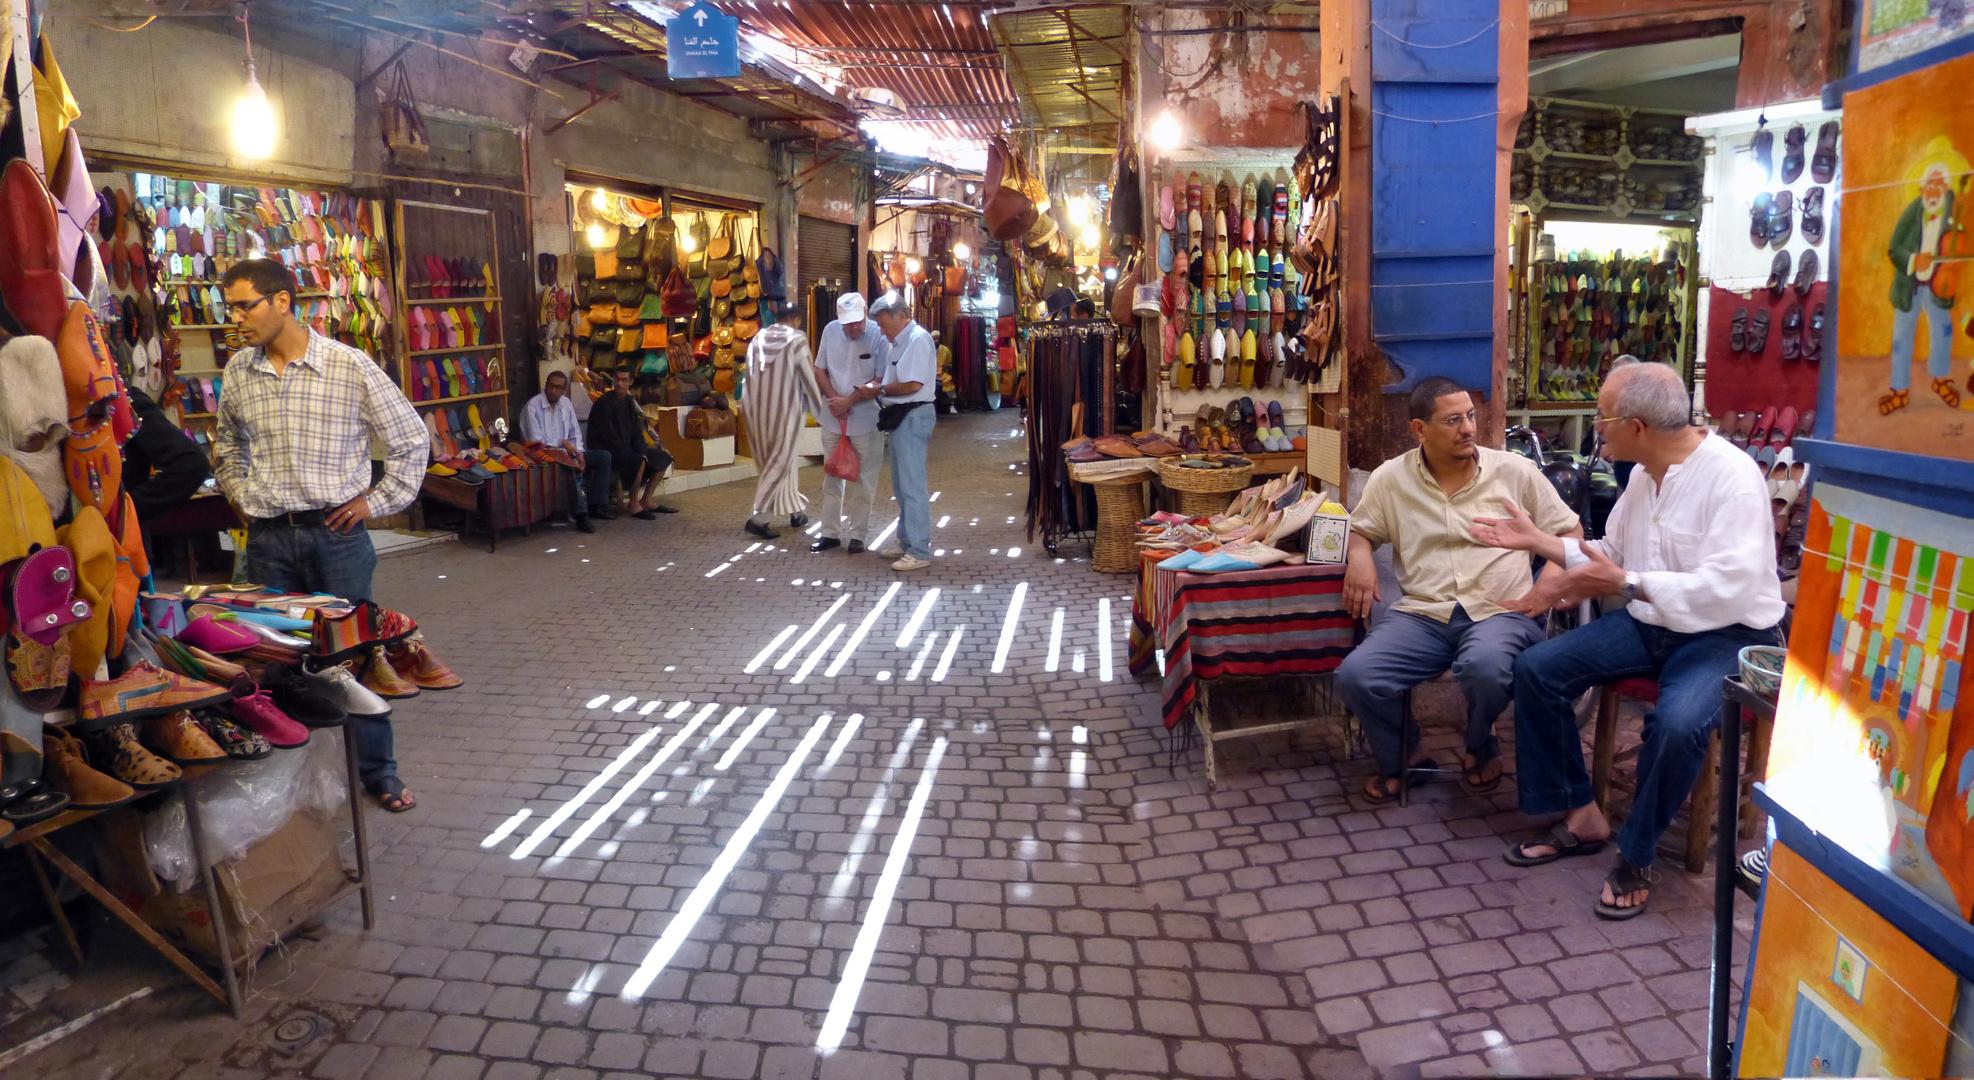 Im Souk La Lkchachbia in Marrakech